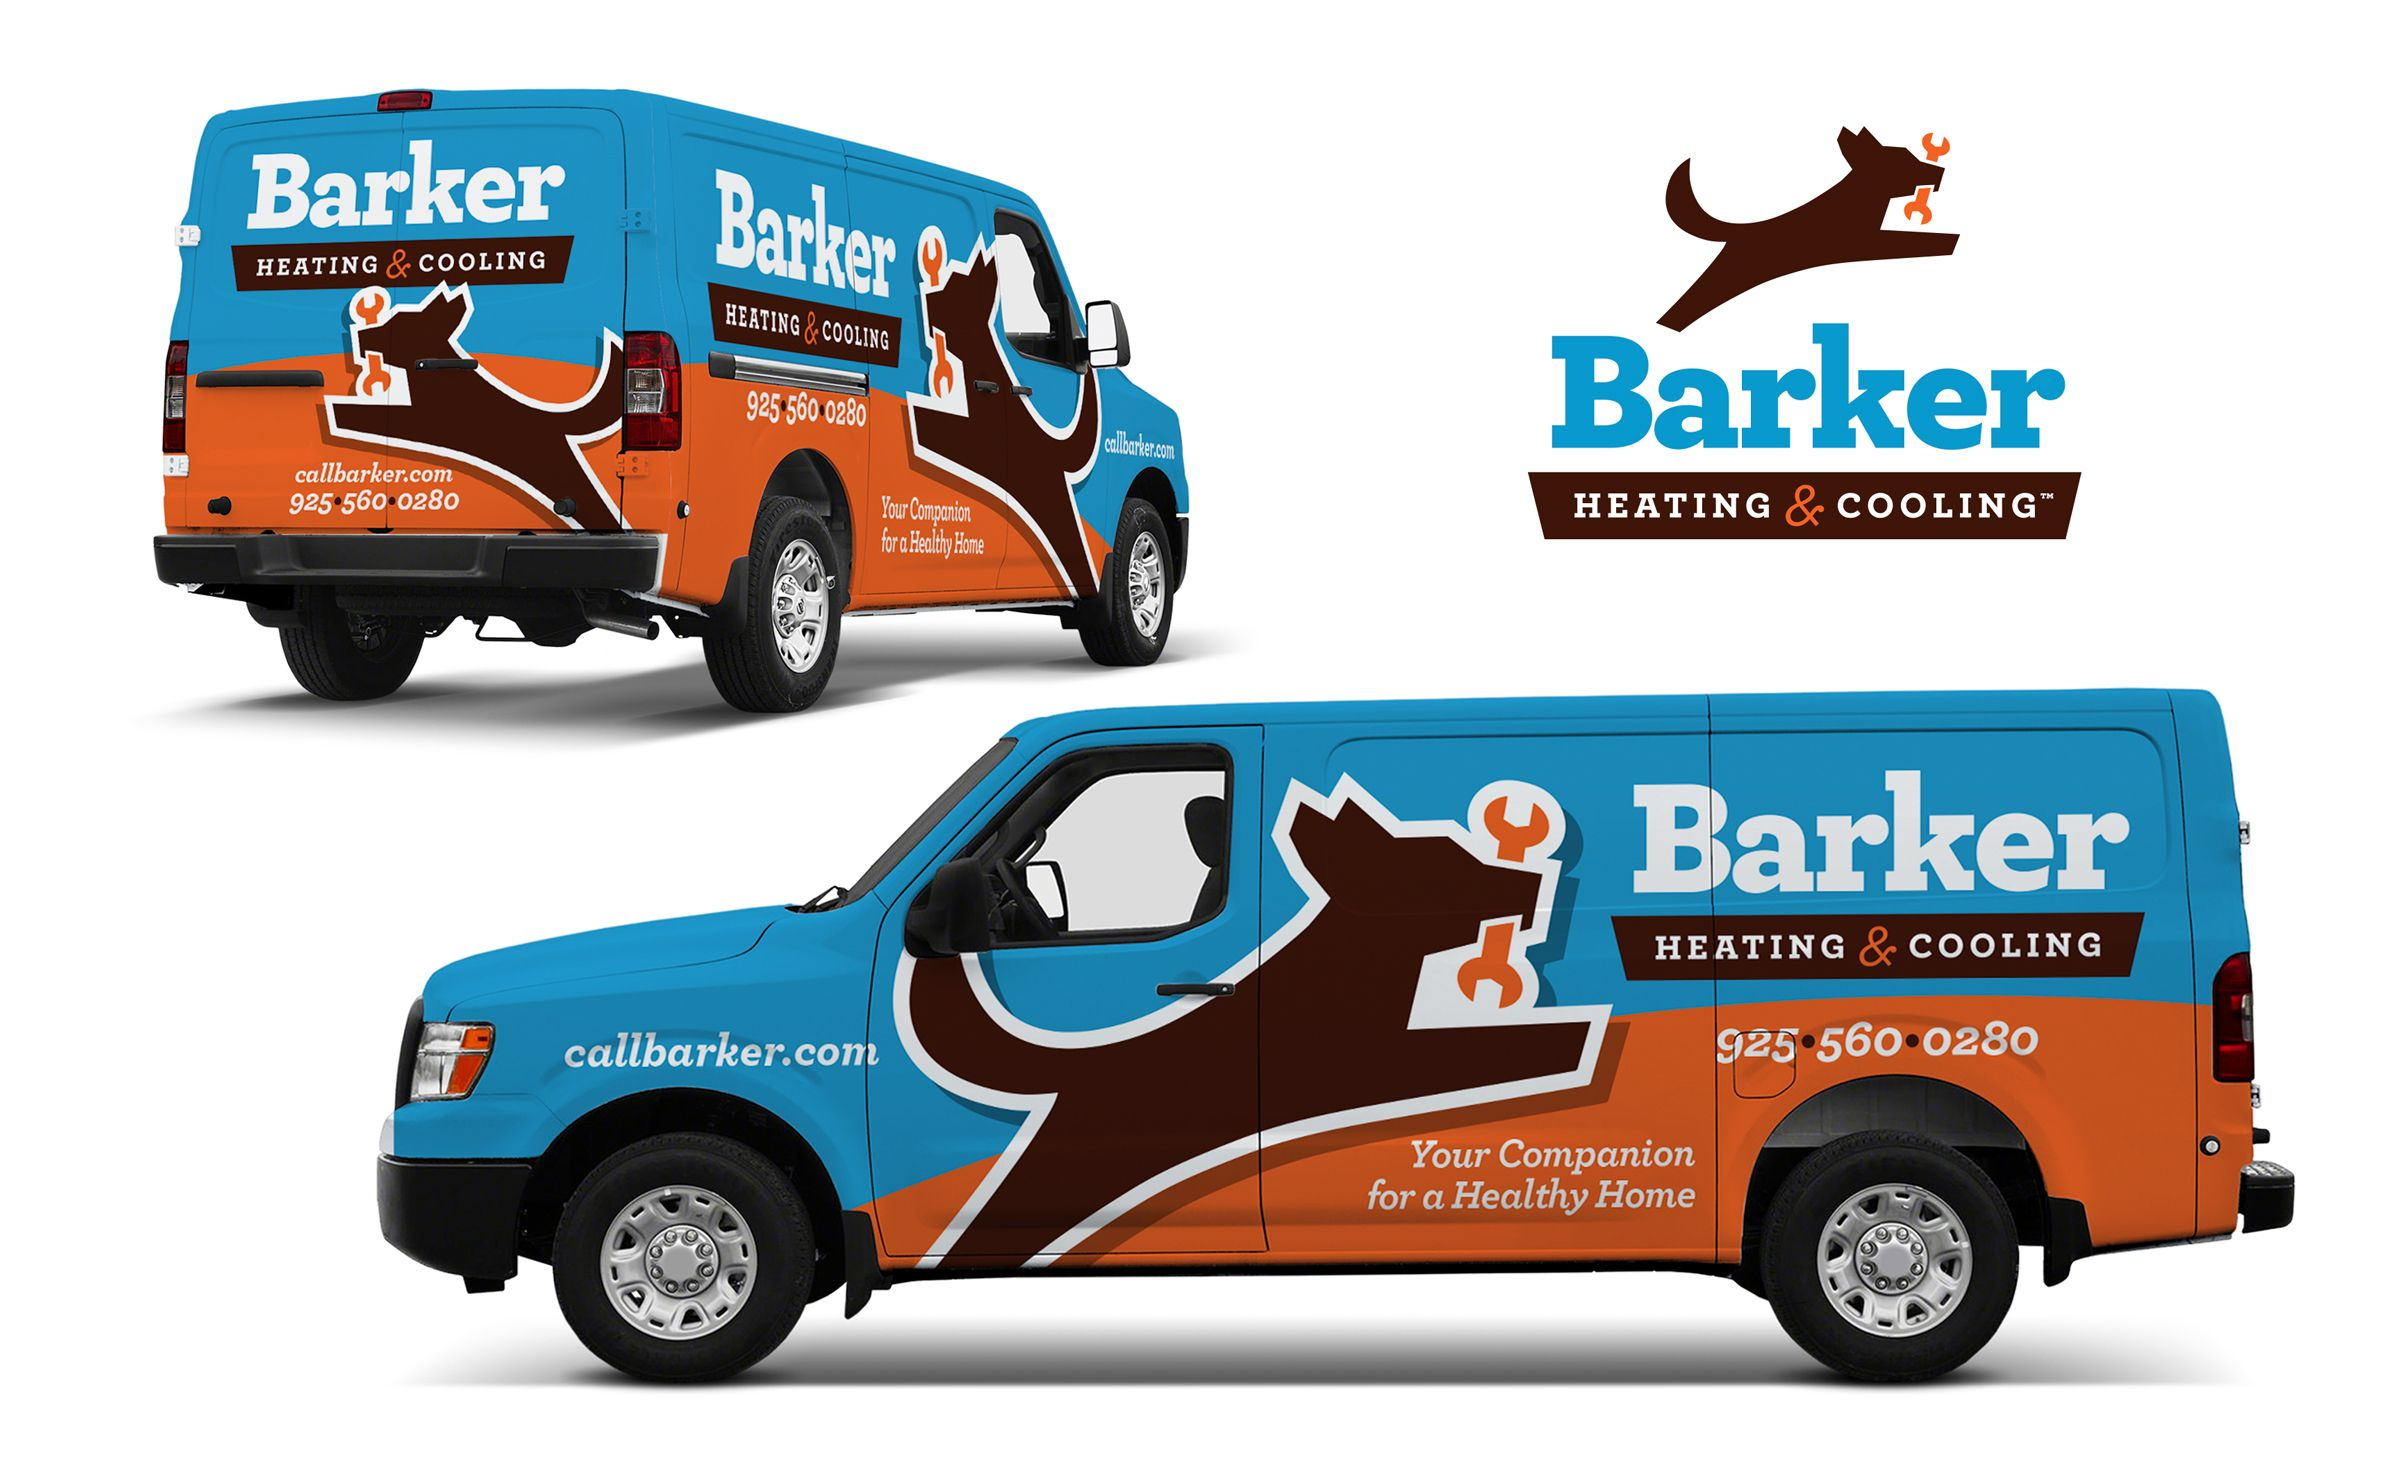 Vehicle Wrap Design For Barker Heating Cooling Nj Advertising